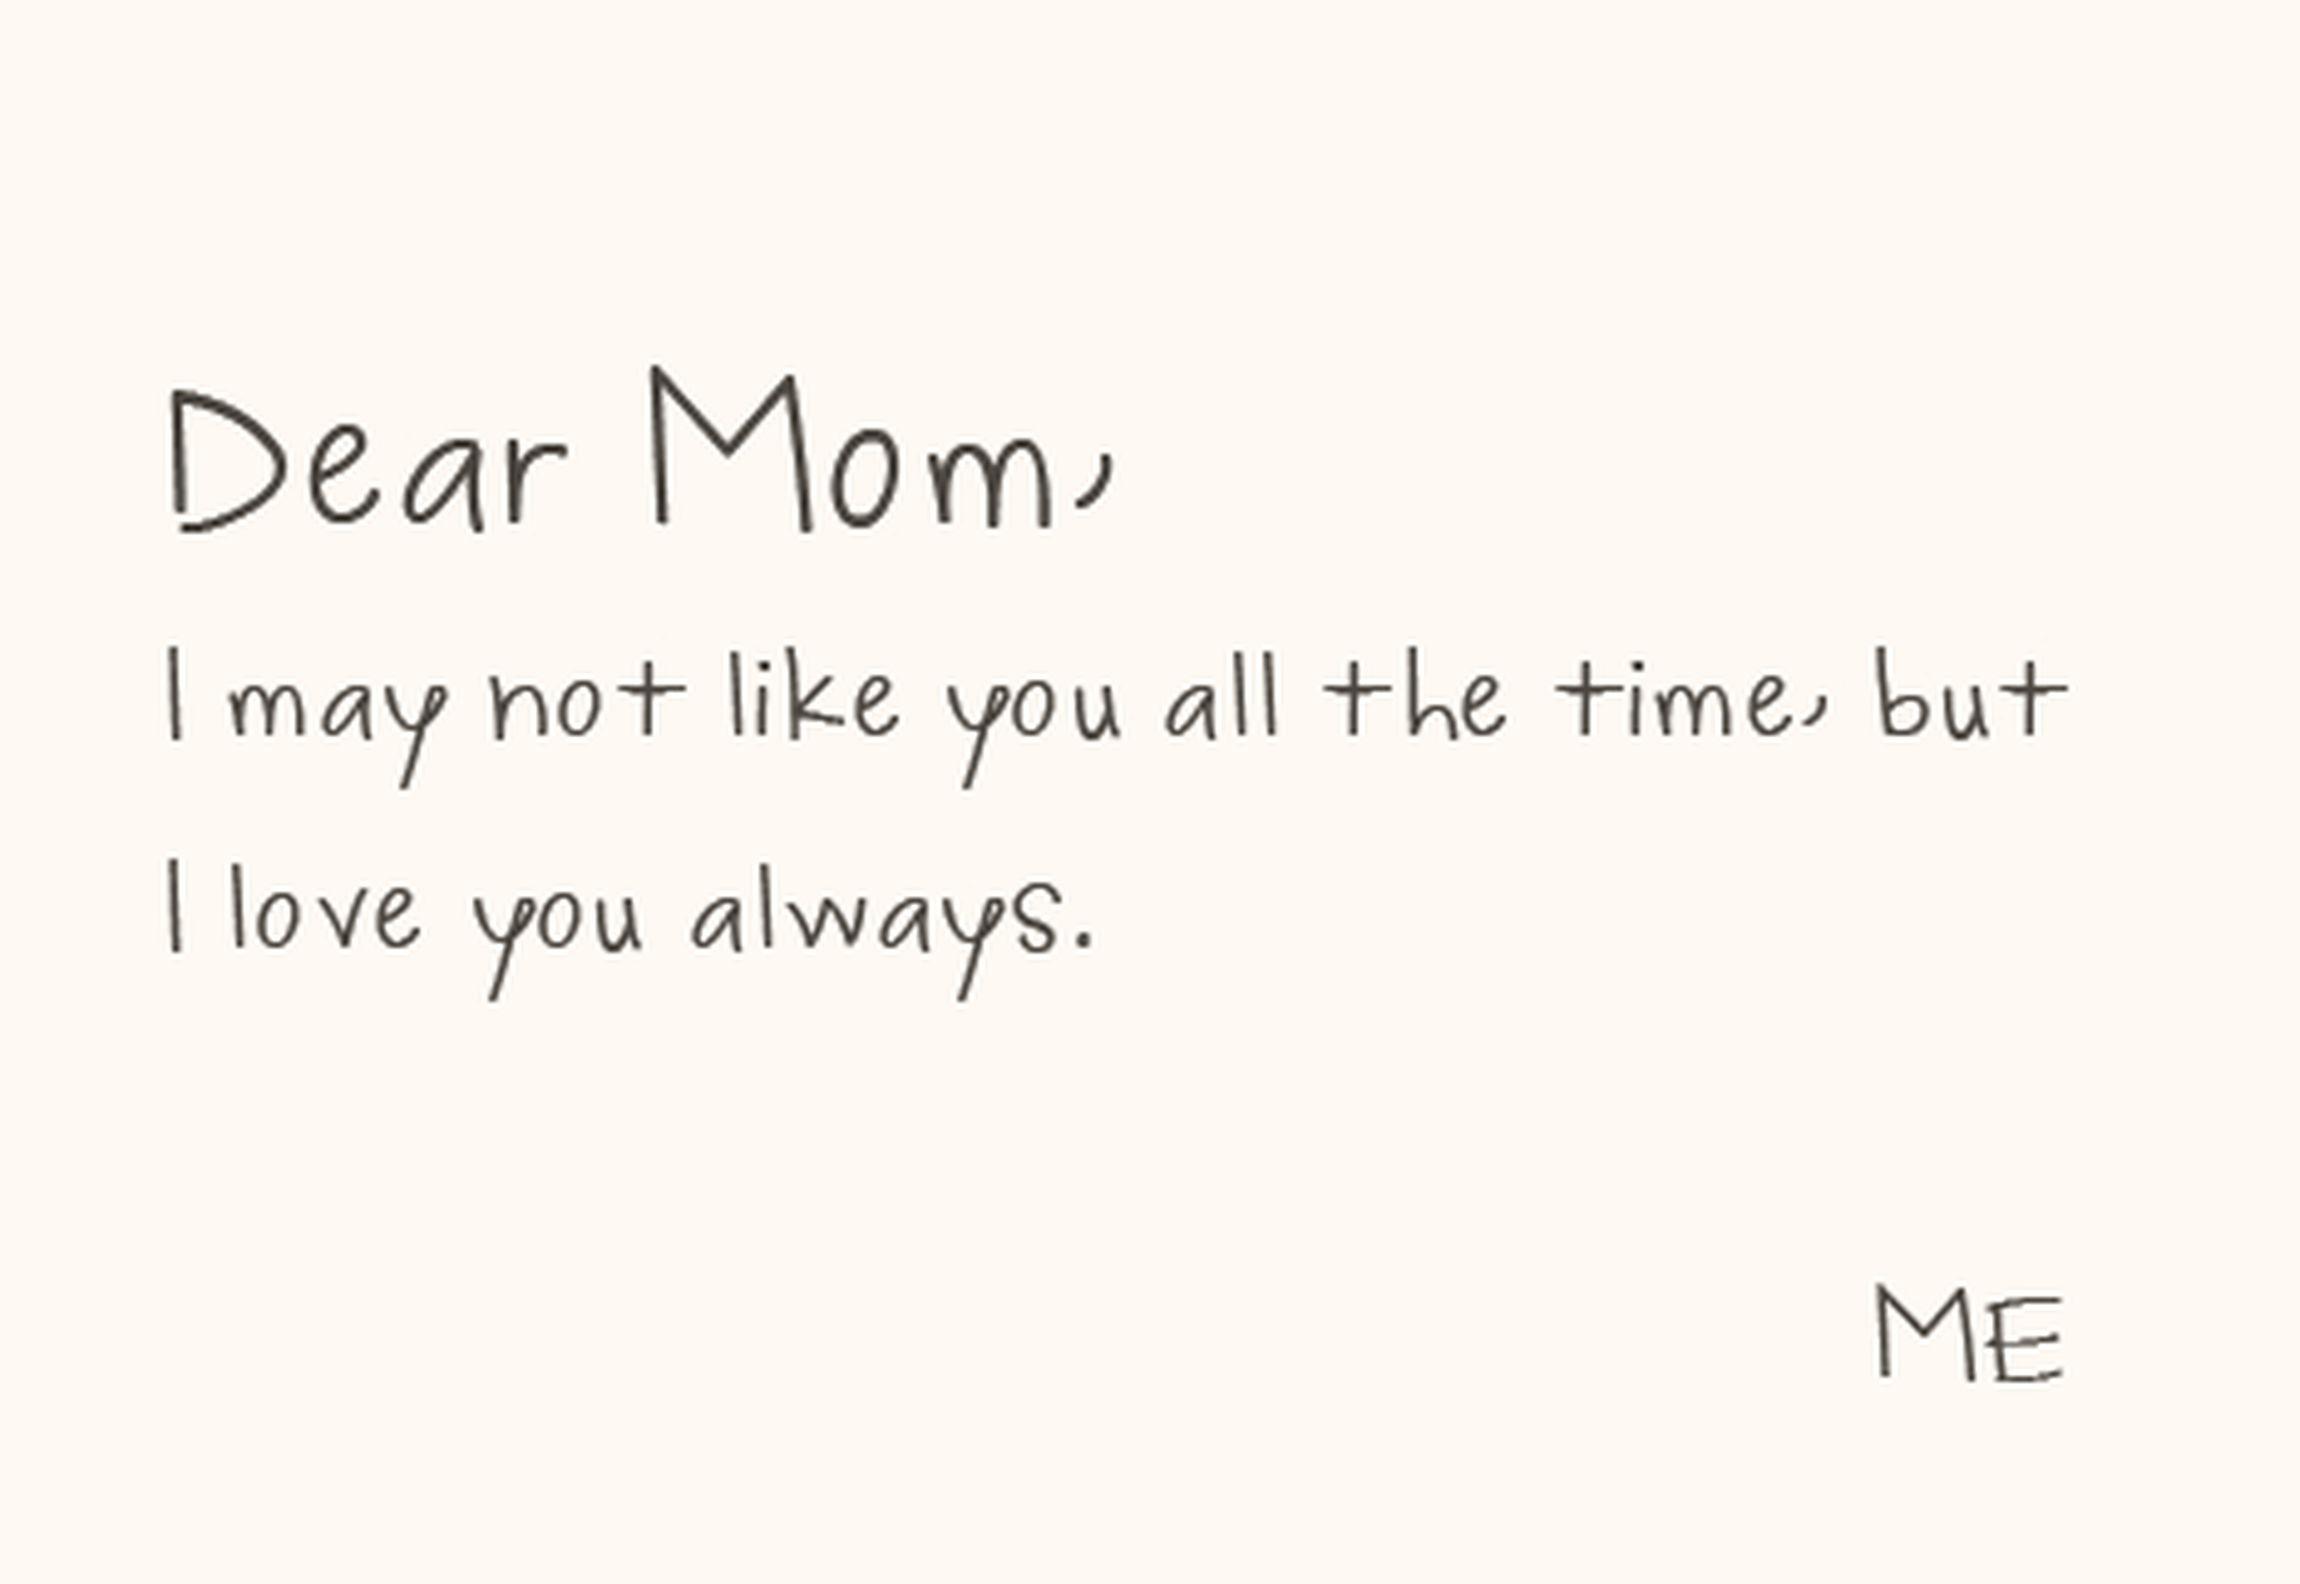 Mothersday2014 Yourethebestmom Loveuforeverandalways Ihopeyourehappy